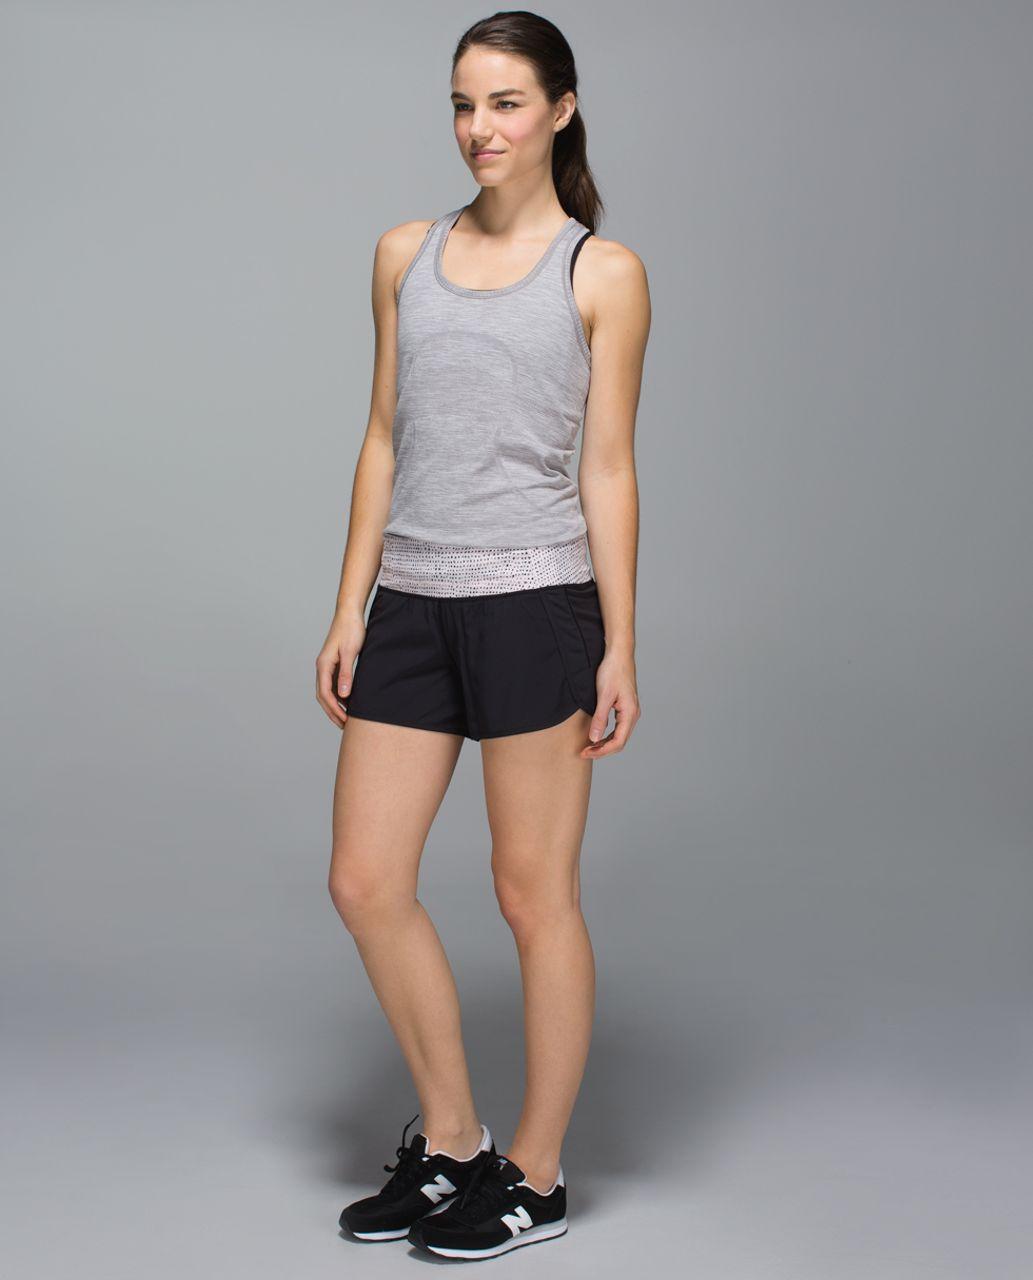 Lululemon Run Times Short *4-way Stretch - Black / Speckle Dot Parfait Pink Black